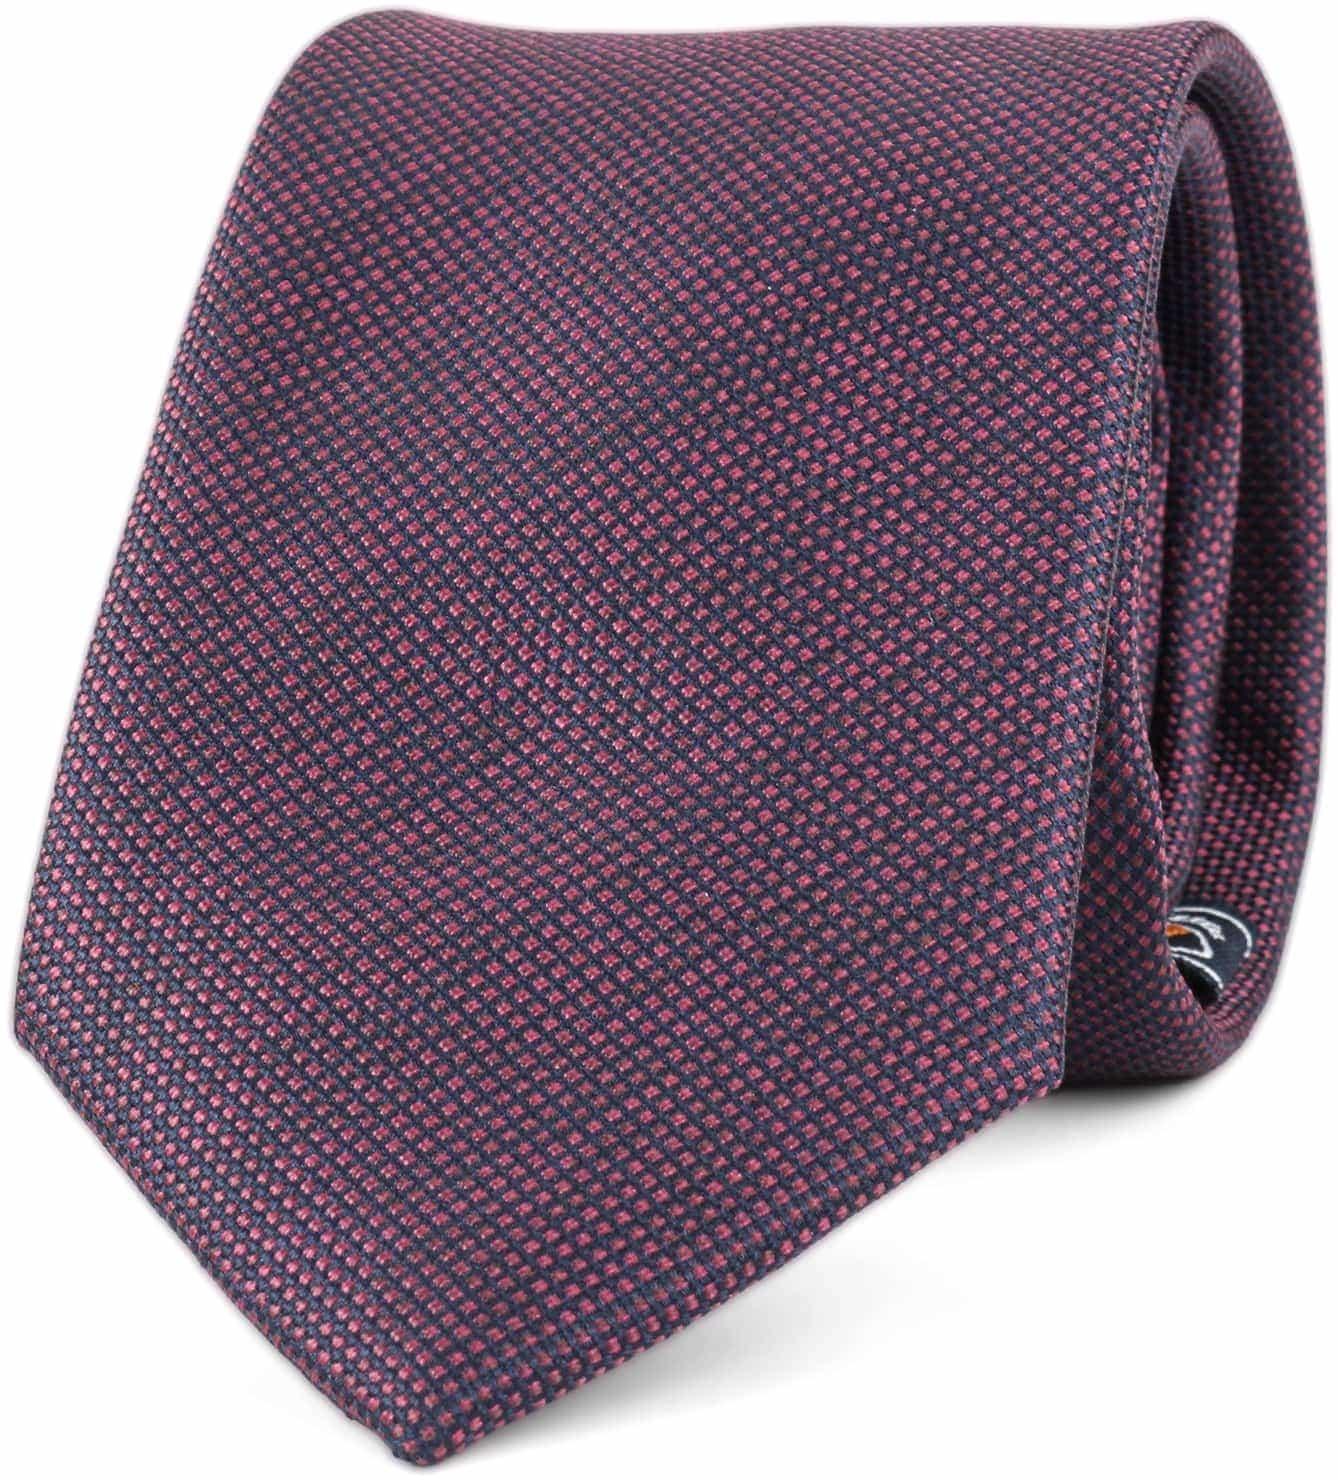 Krawatte Seide Pinpoint Bordeaux 9-17 foto 0